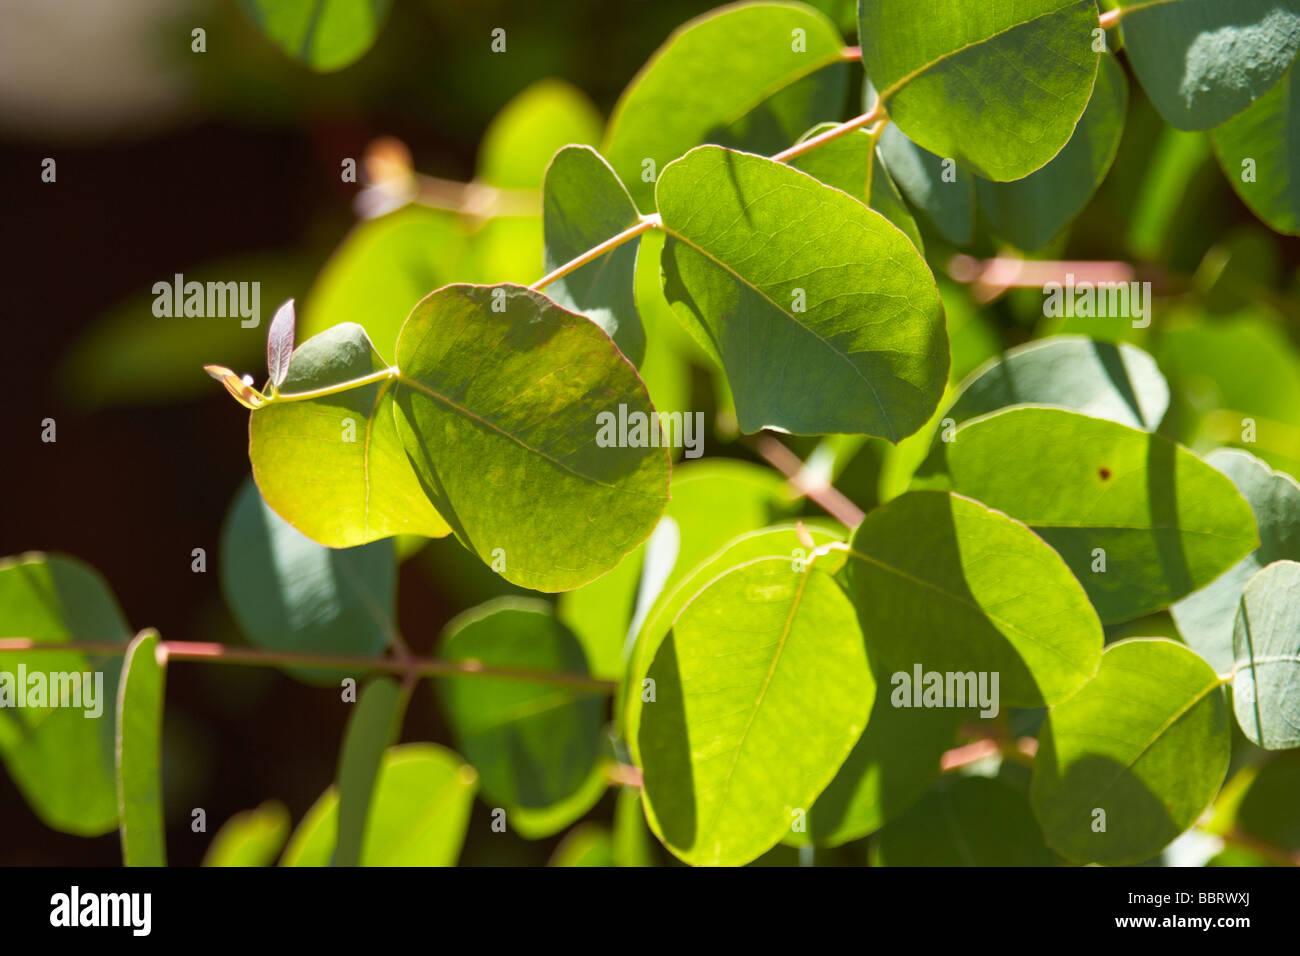 eucalyptus,plant,foliage - Stock Image